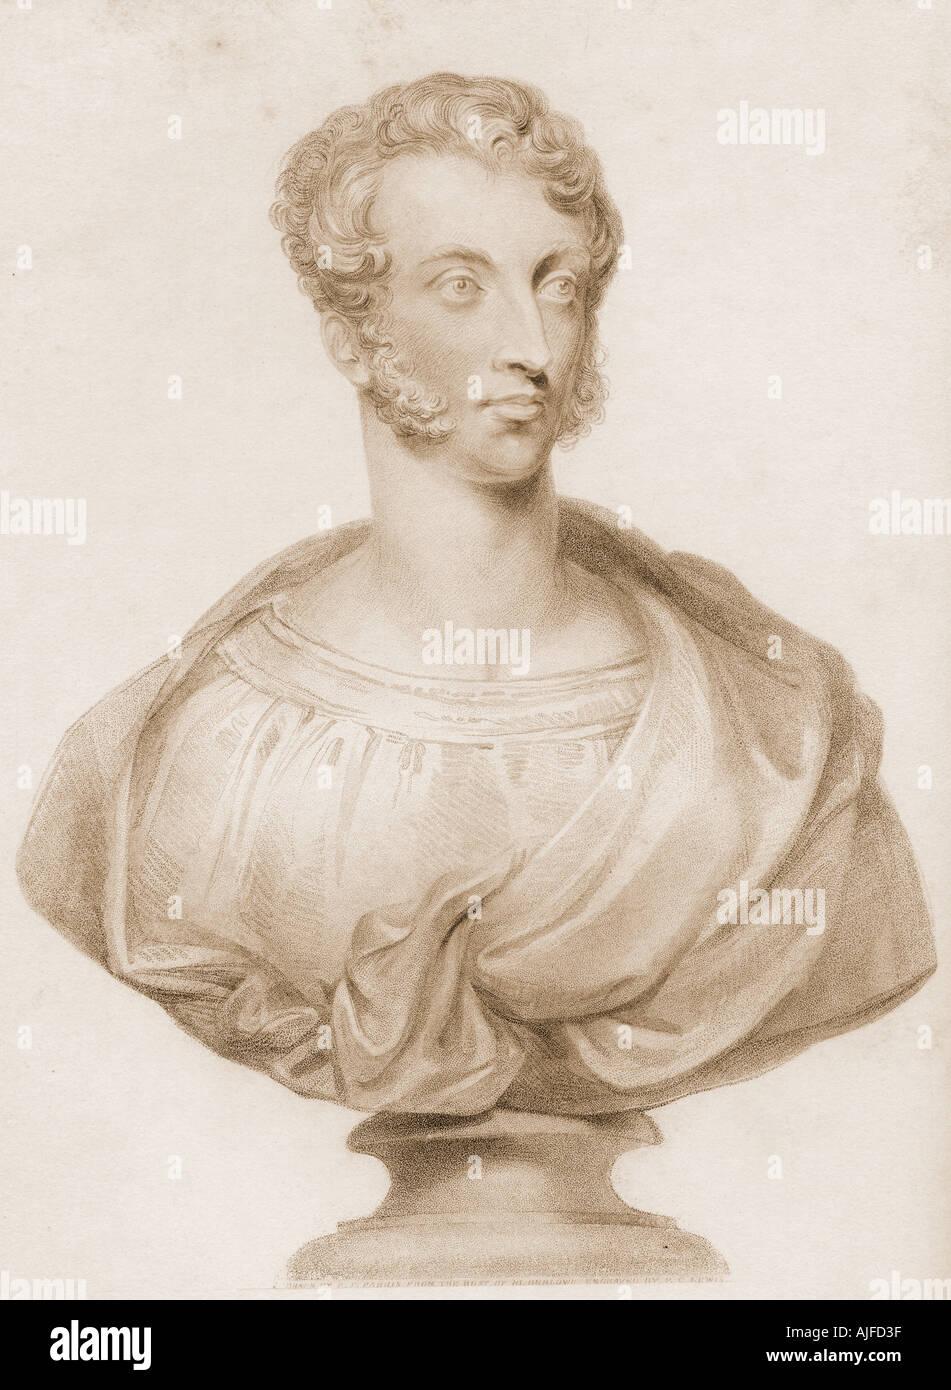 Edward George Earle Lytton Bulwer-Lytton,1st Baron Lytton, 1803 - 1873. English novelist, poet, playwright and politician Stock Photo